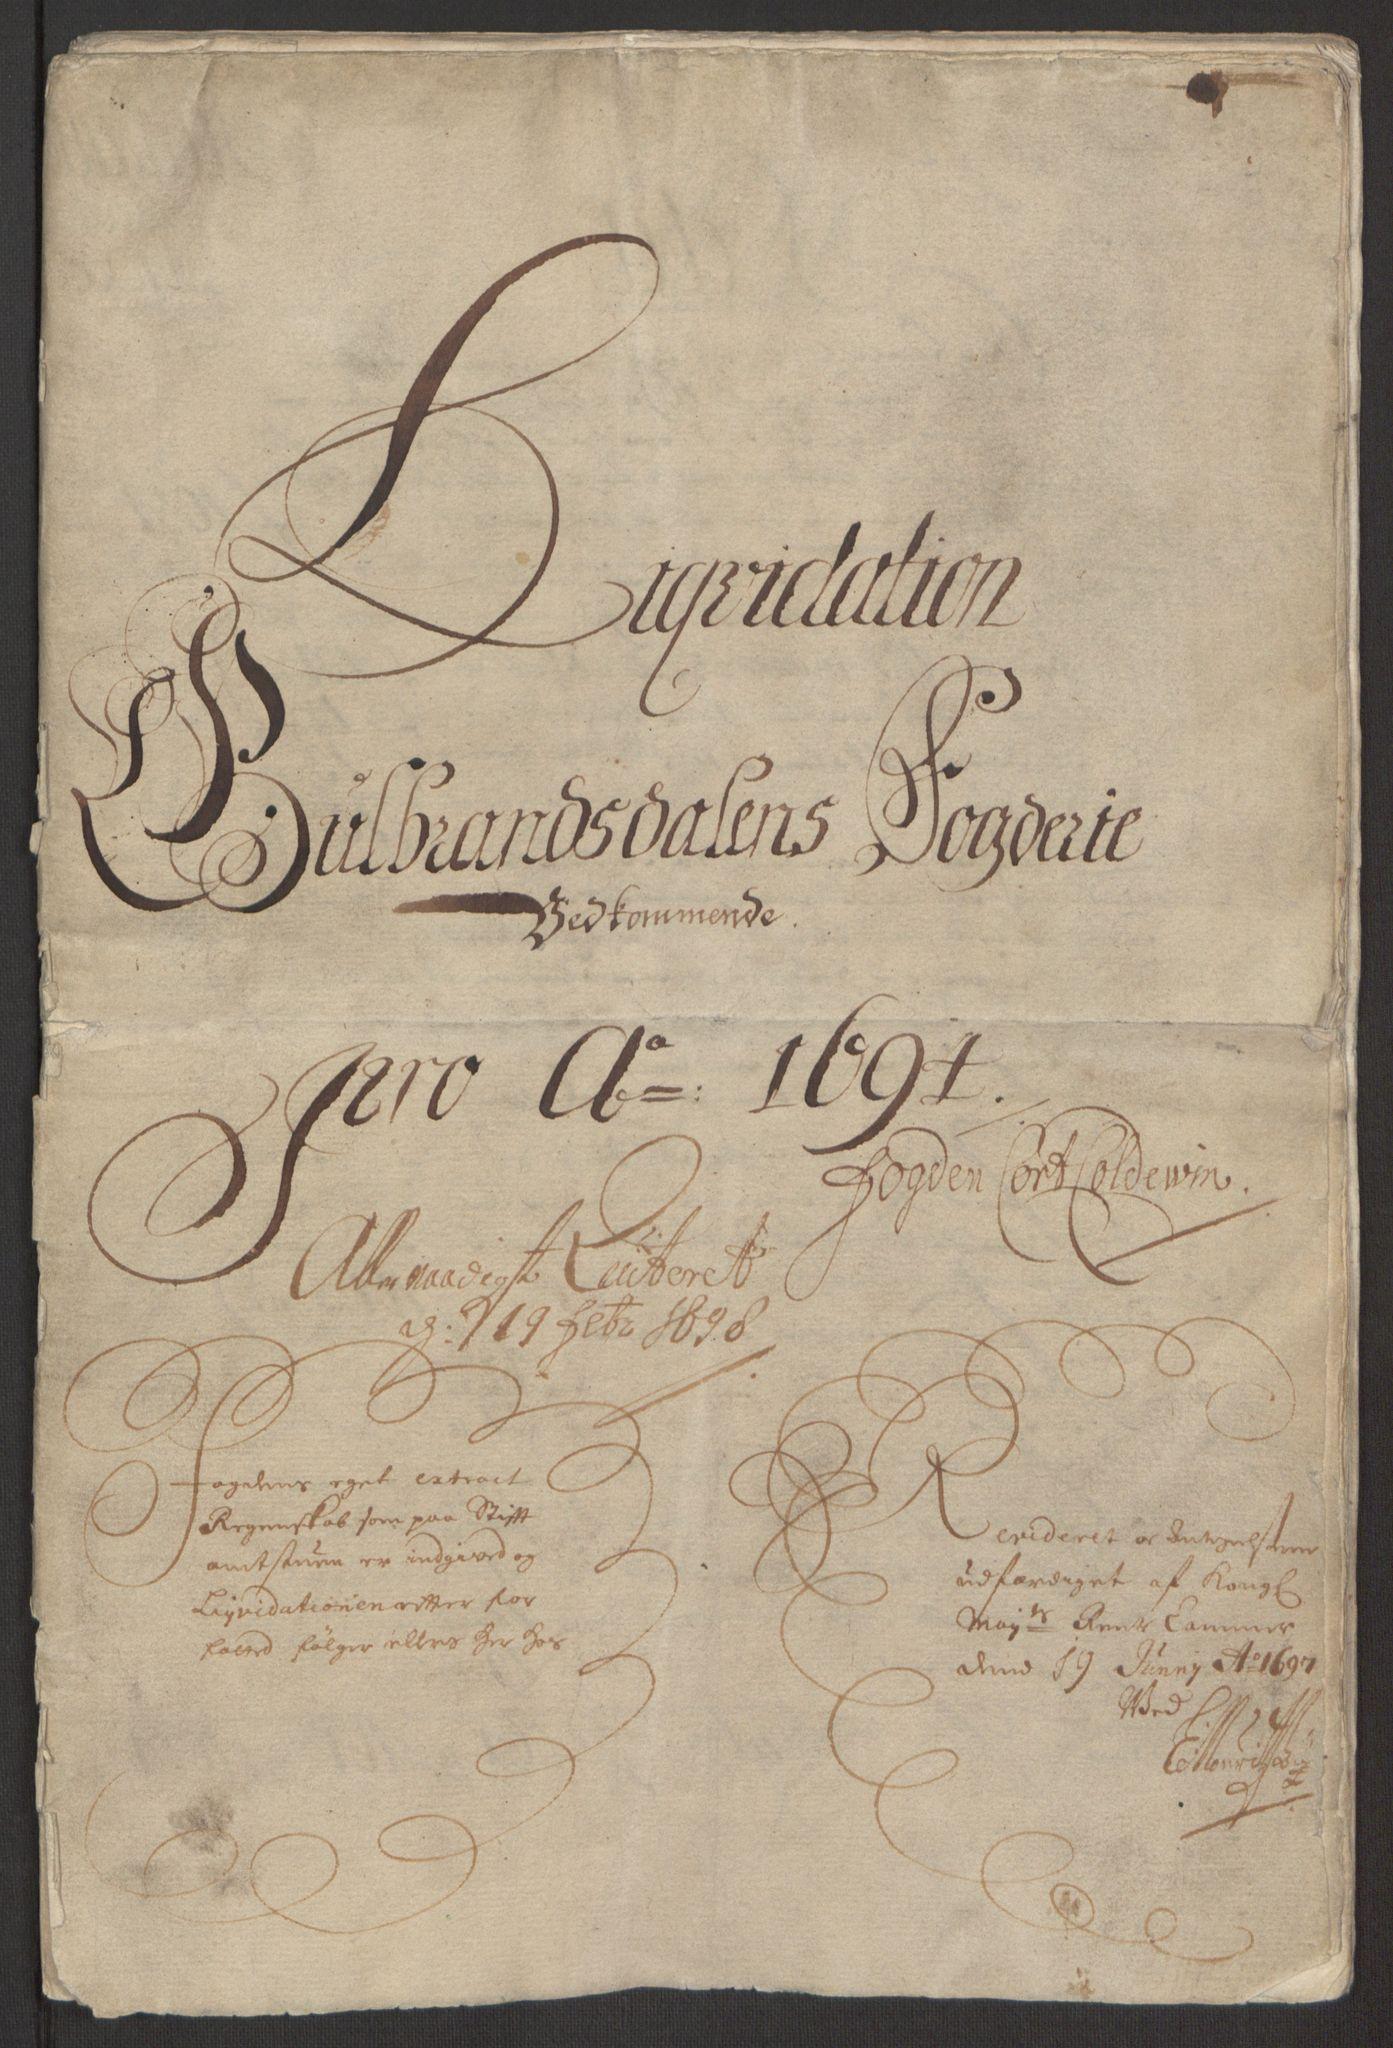 RA, Rentekammeret inntil 1814, Reviderte regnskaper, Fogderegnskap, R17/L1168: Fogderegnskap Gudbrandsdal, 1694, s. 3